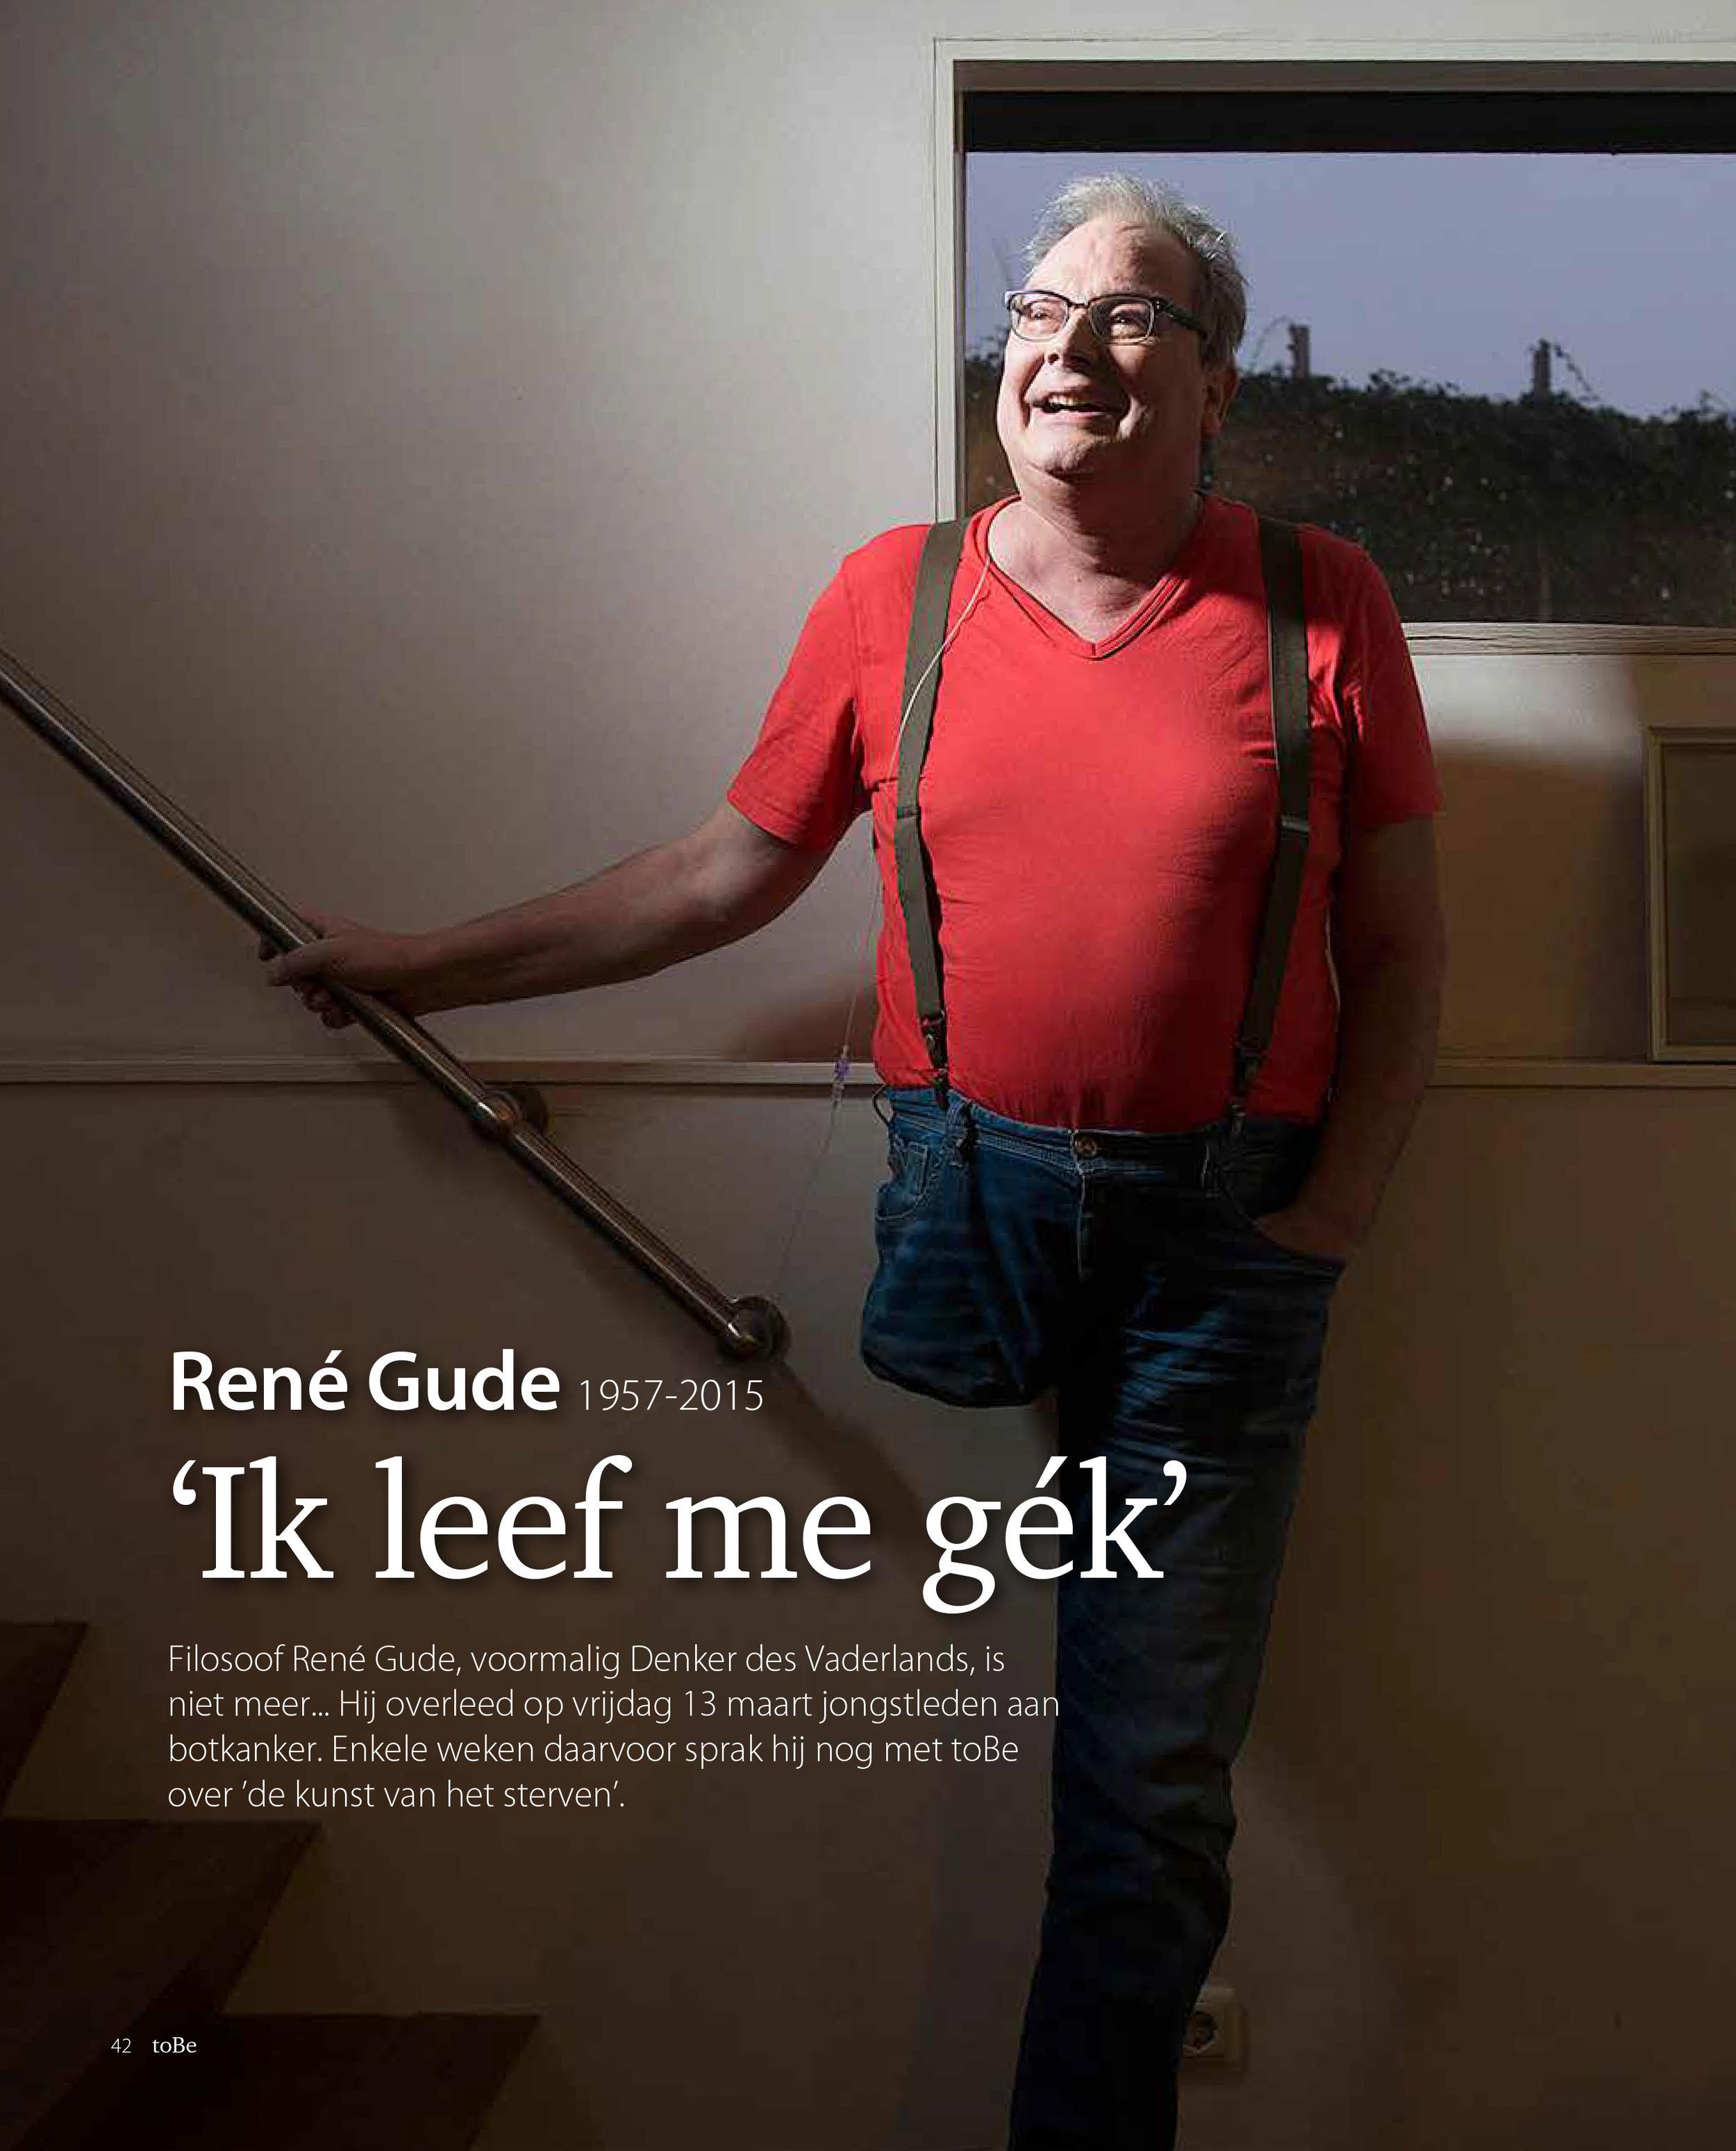 Rene Gudde